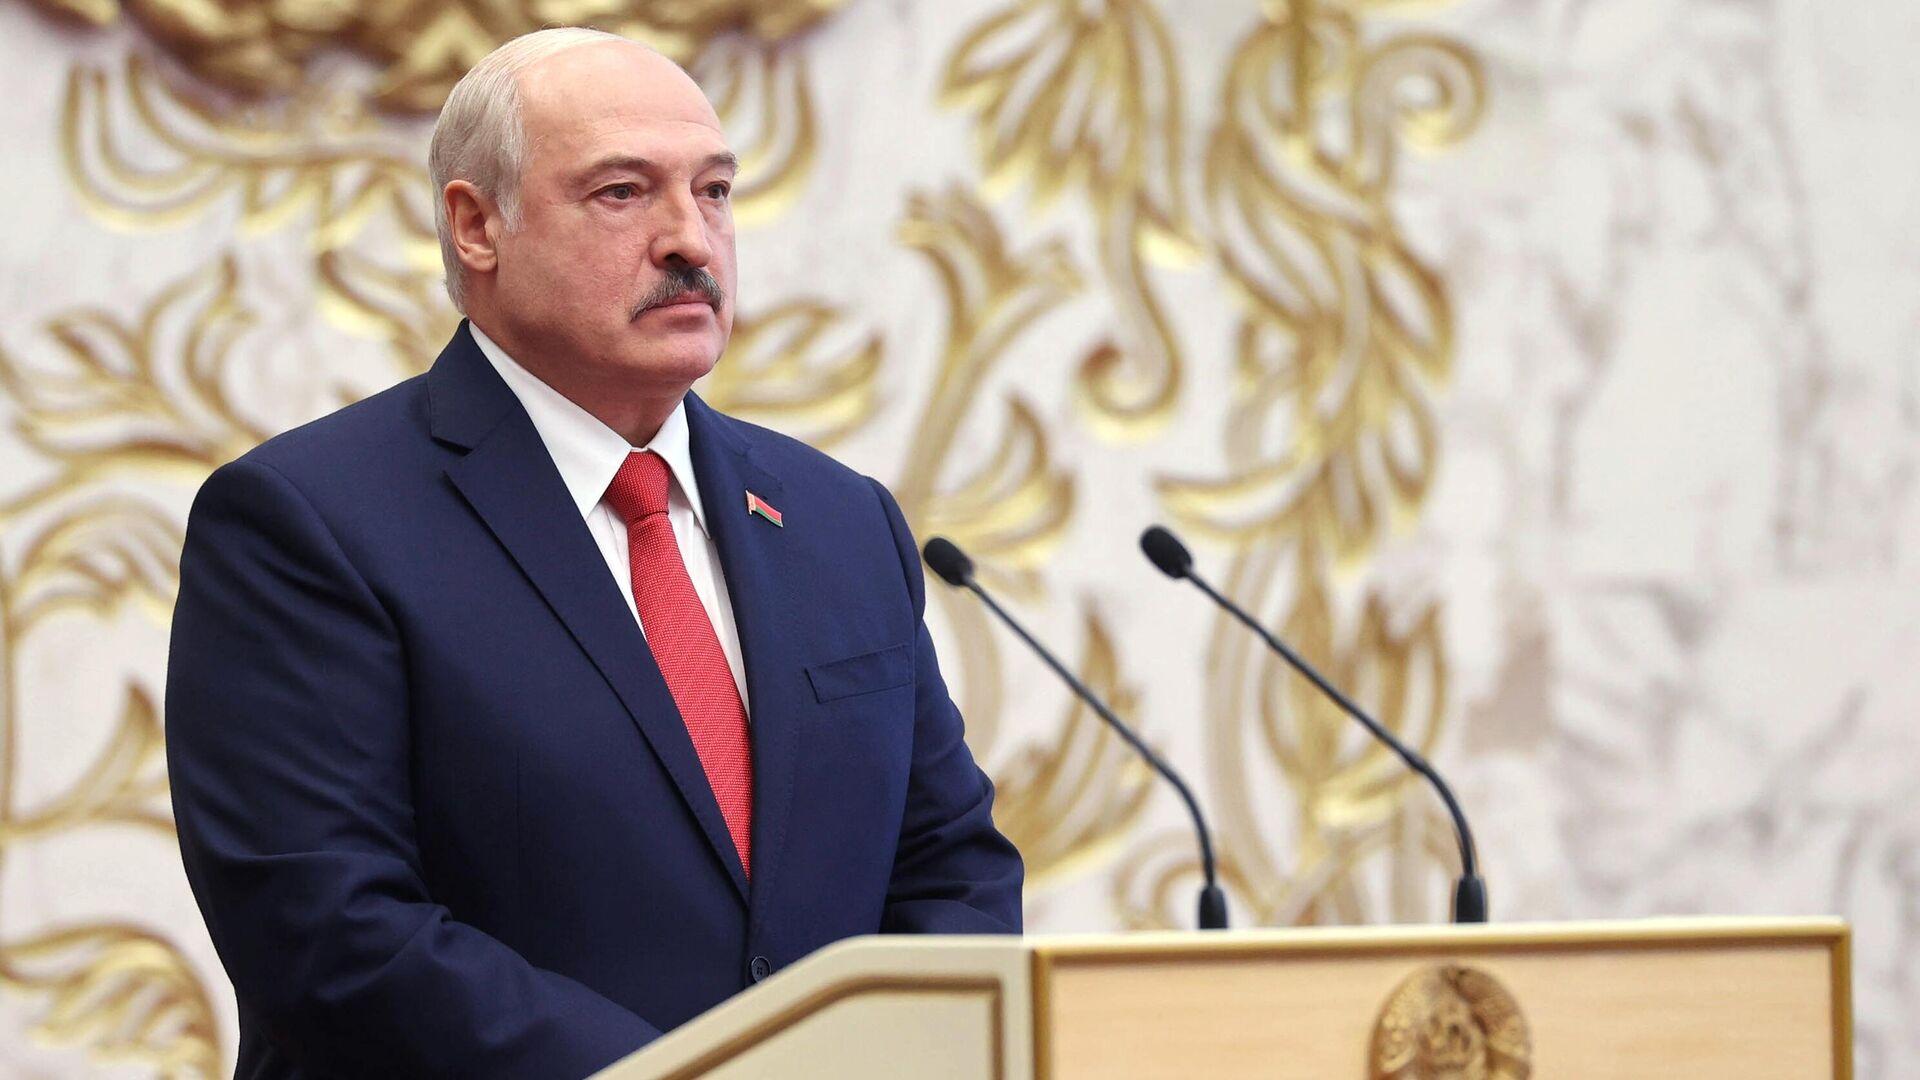 Президент Белоруссии Александр Лукашенко на церемонии инаугурации в Минске - РИА Новости, 1920, 12.10.2020